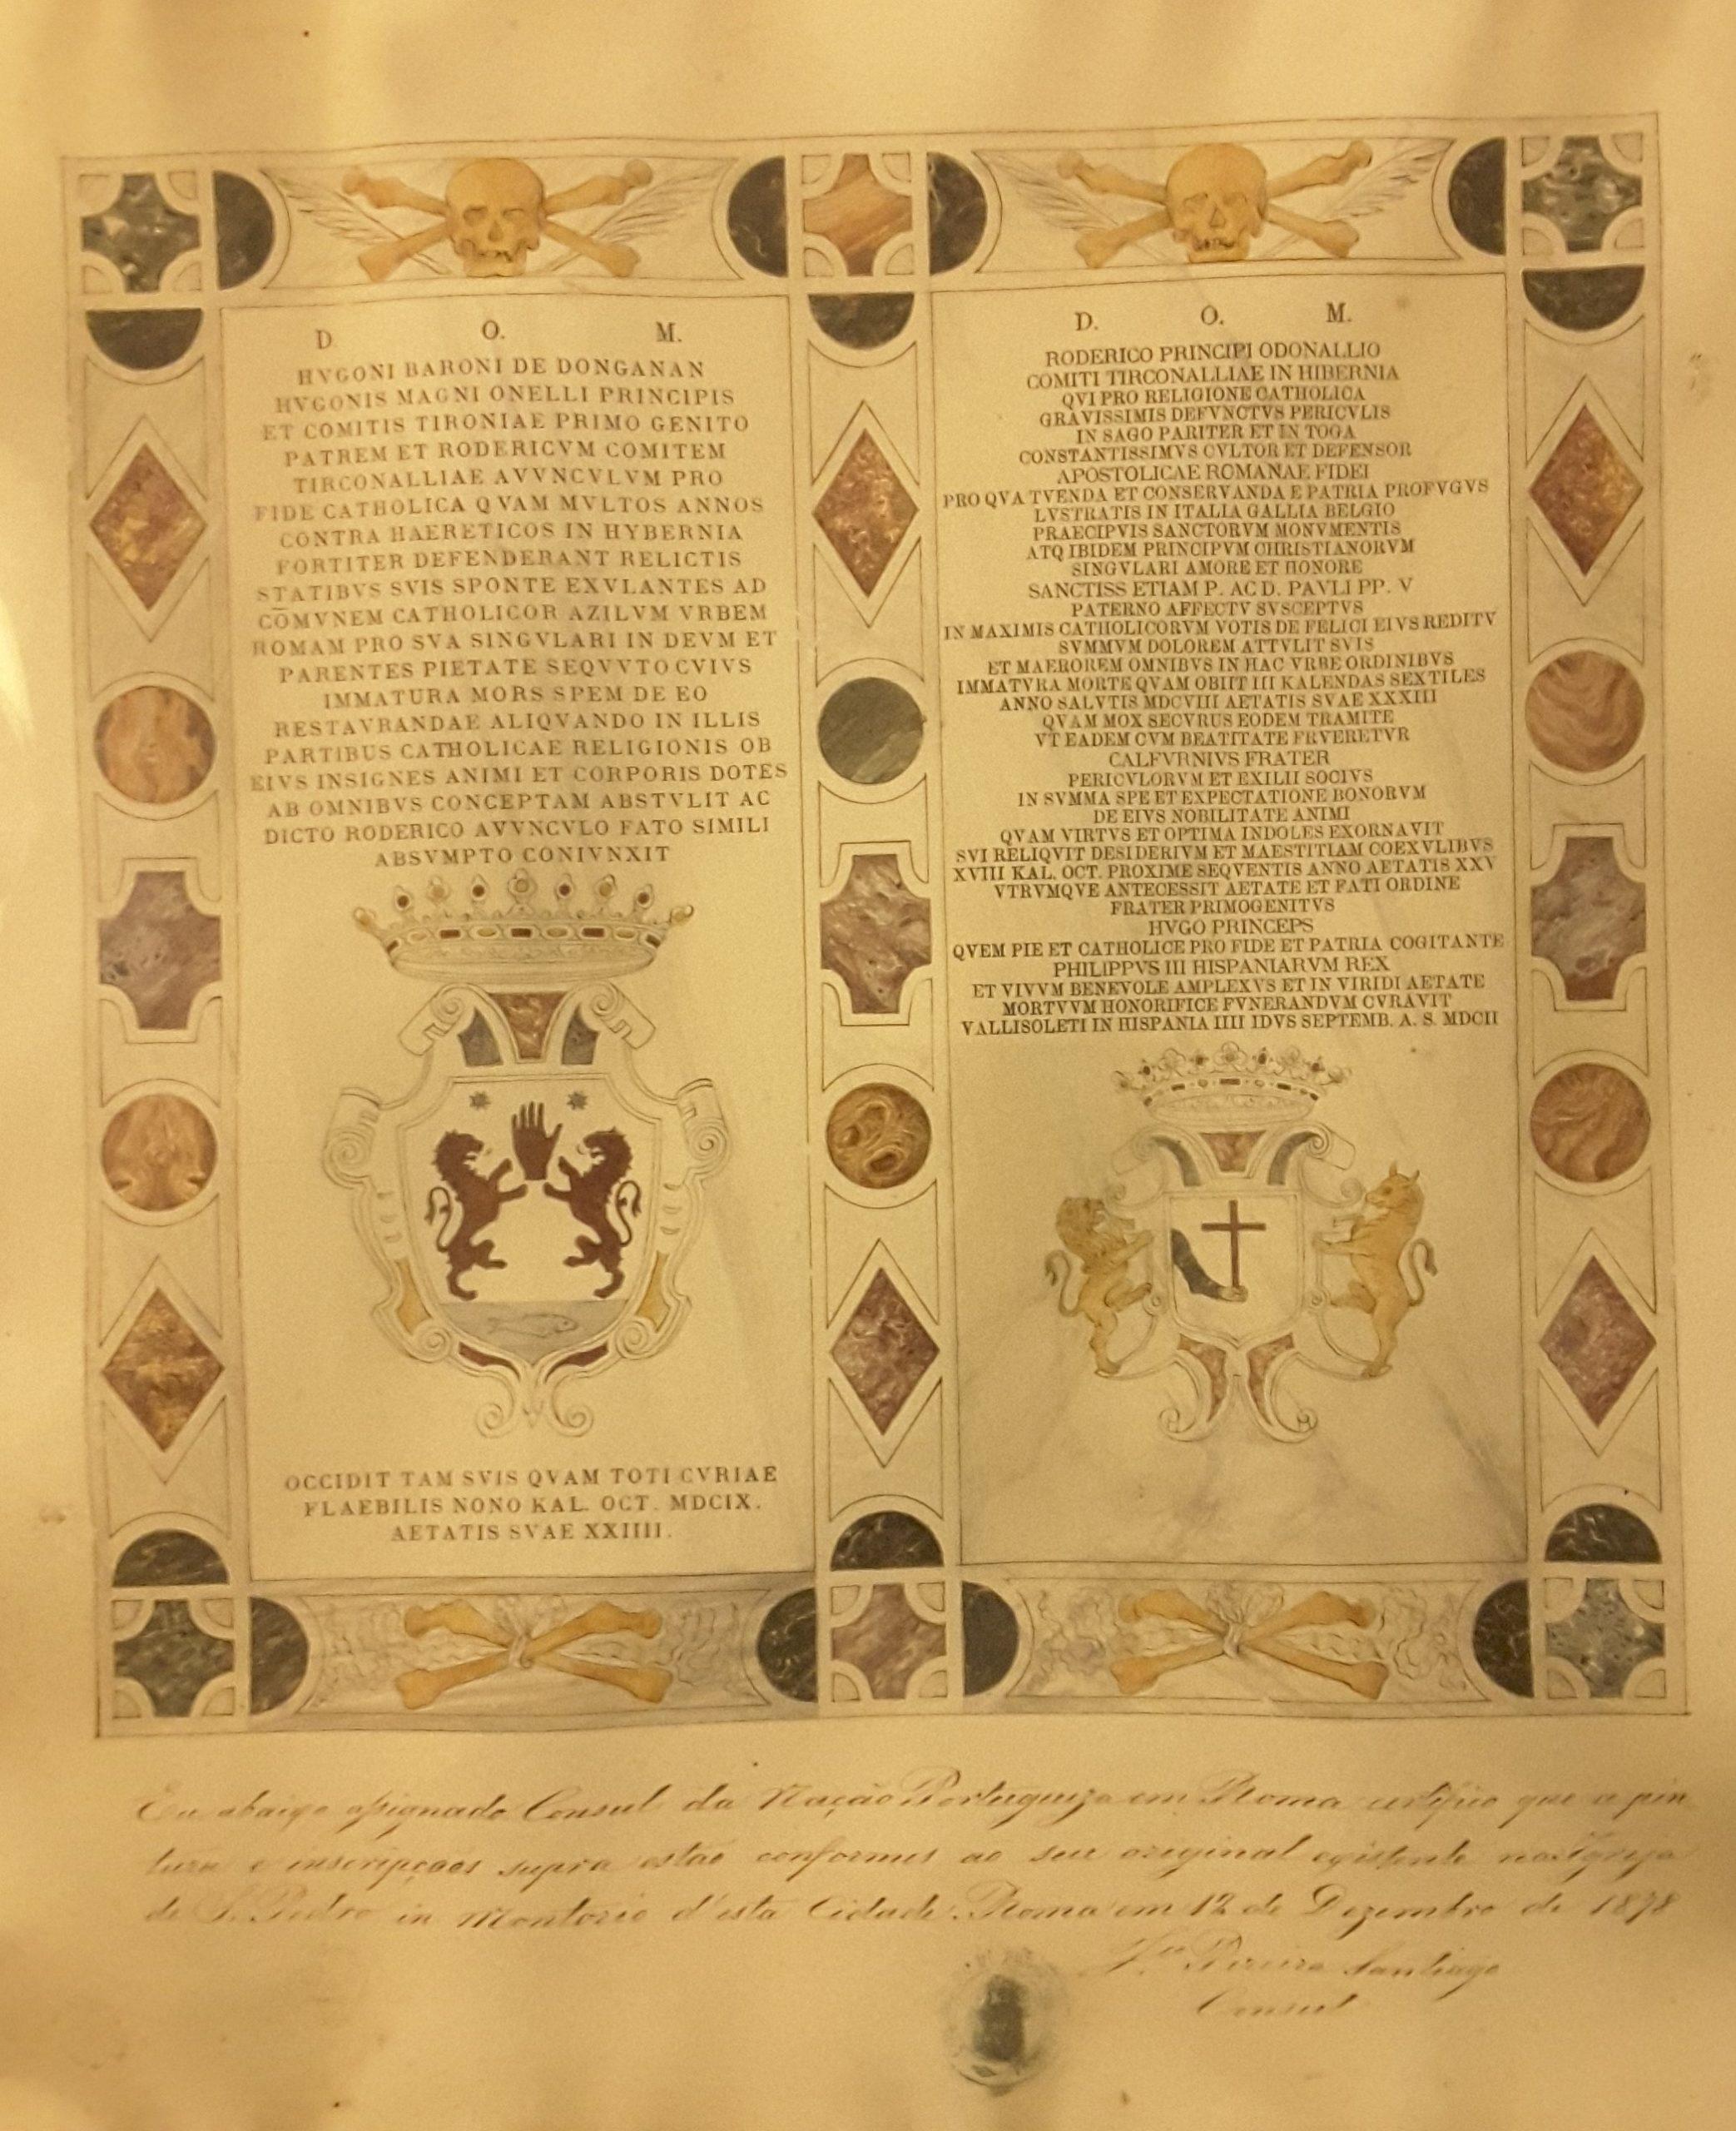 Copie enluminée des stèles des princes Hugues O'Neill baron de Dungannon et Hugues O'Donnell comte de Tyrconnell - San Pietro di Montorio, Rome (Don de Hugo O'Neill).